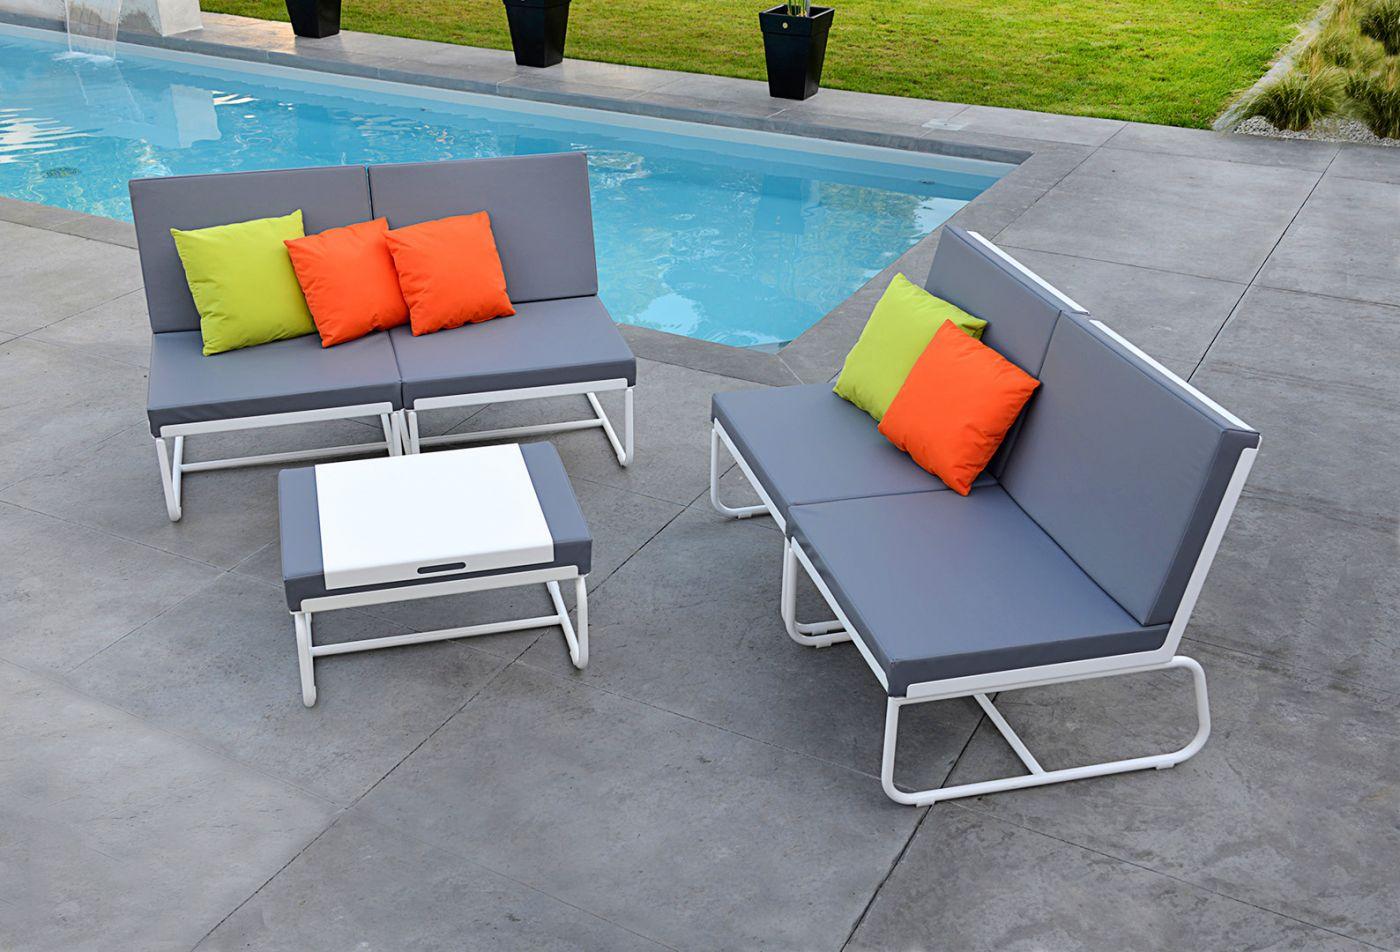 Pouf terrasse design cuir-marin aluminium PURE PIKS Art'Mely